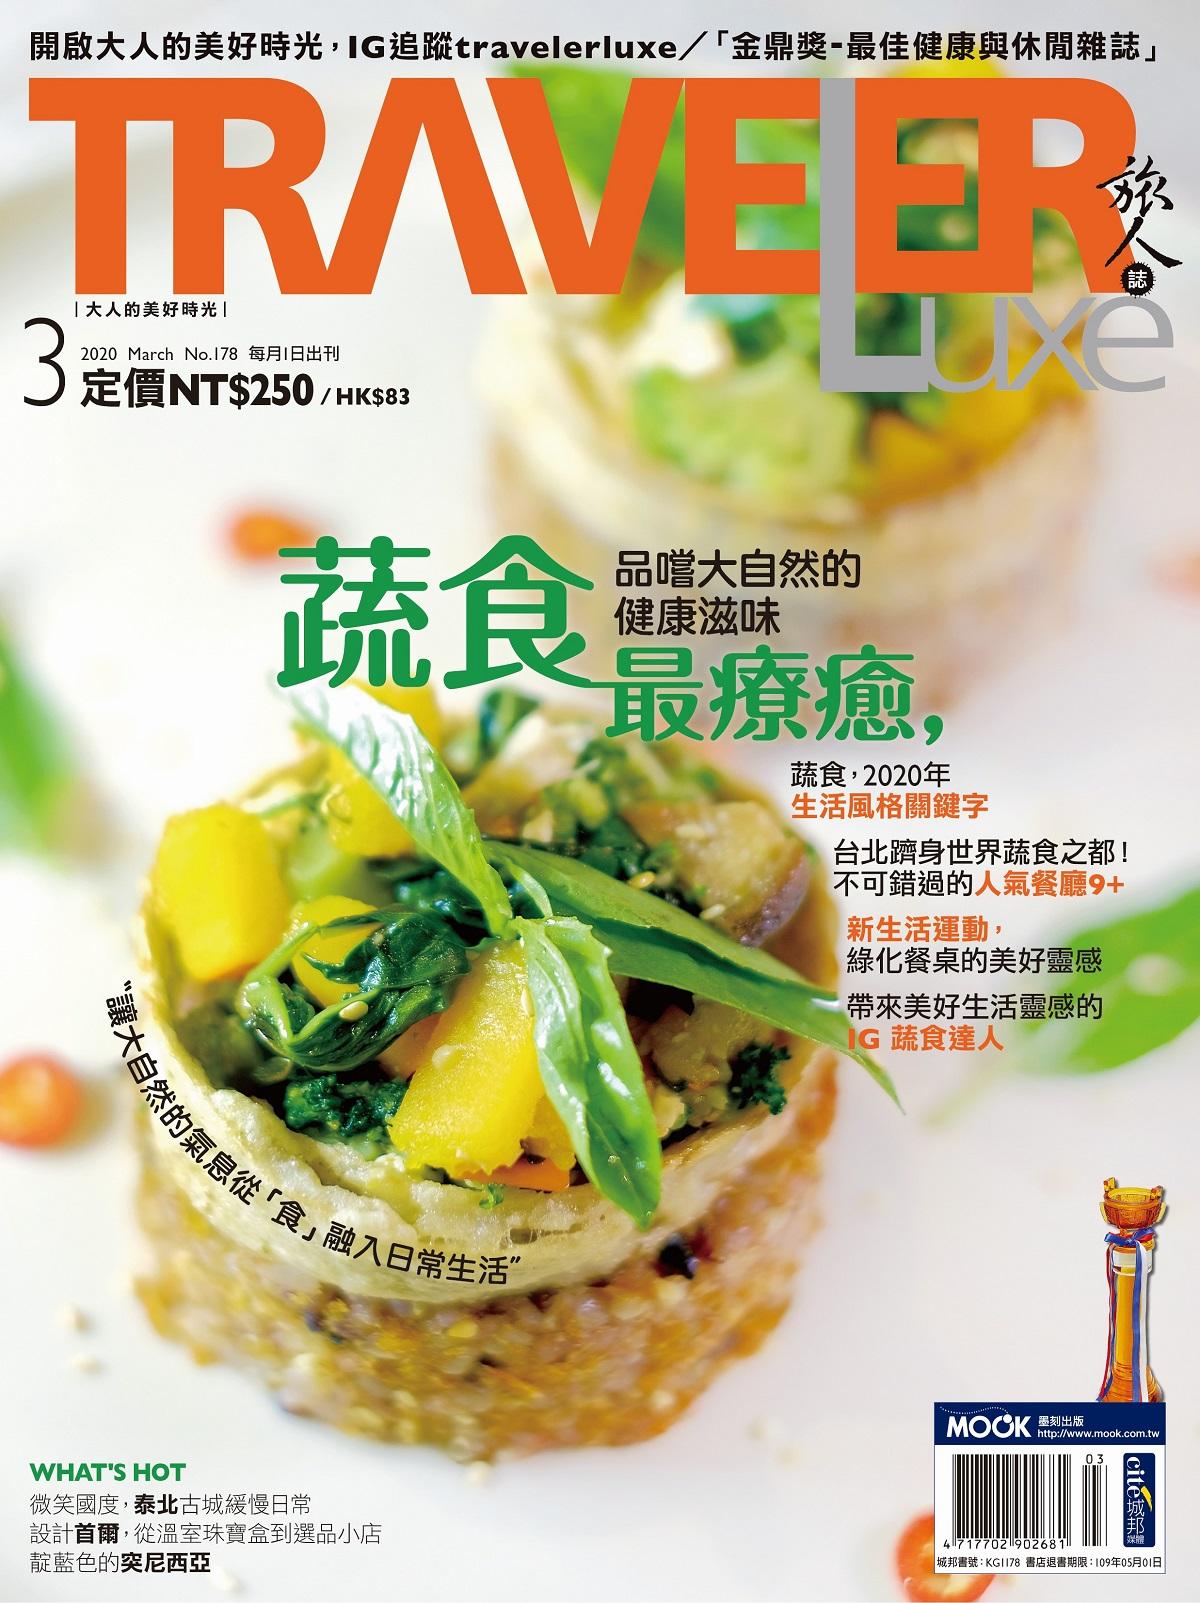 TRAVELER LUXE 旅人誌 3月號/2020 第178期